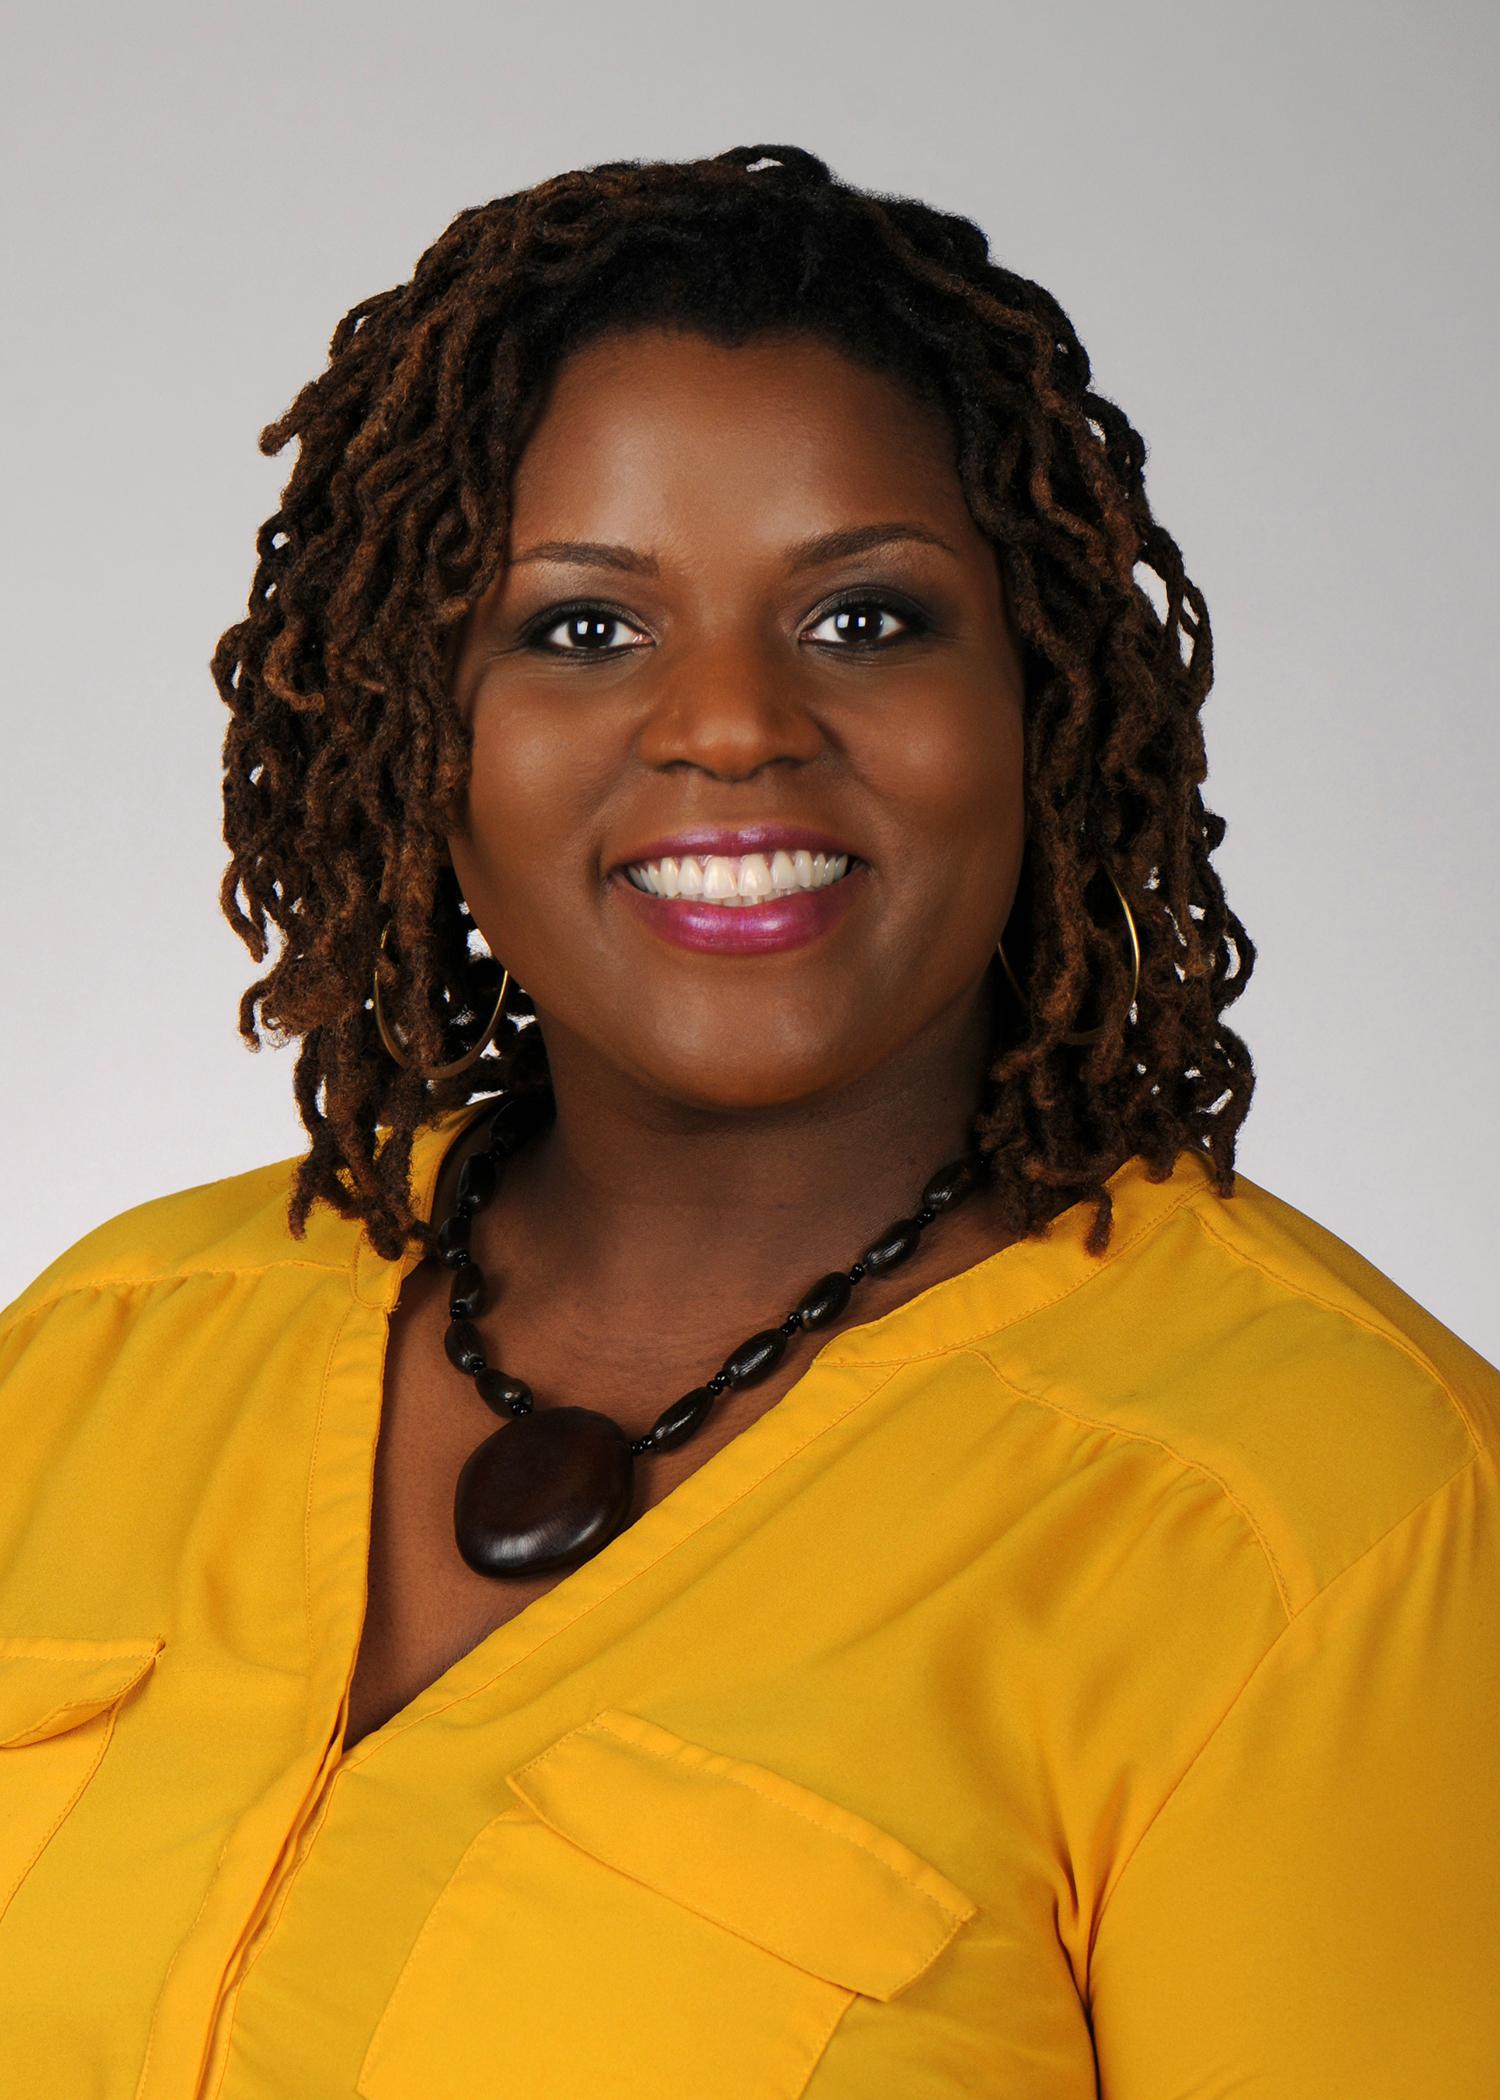 Image of Tabitha Samuel